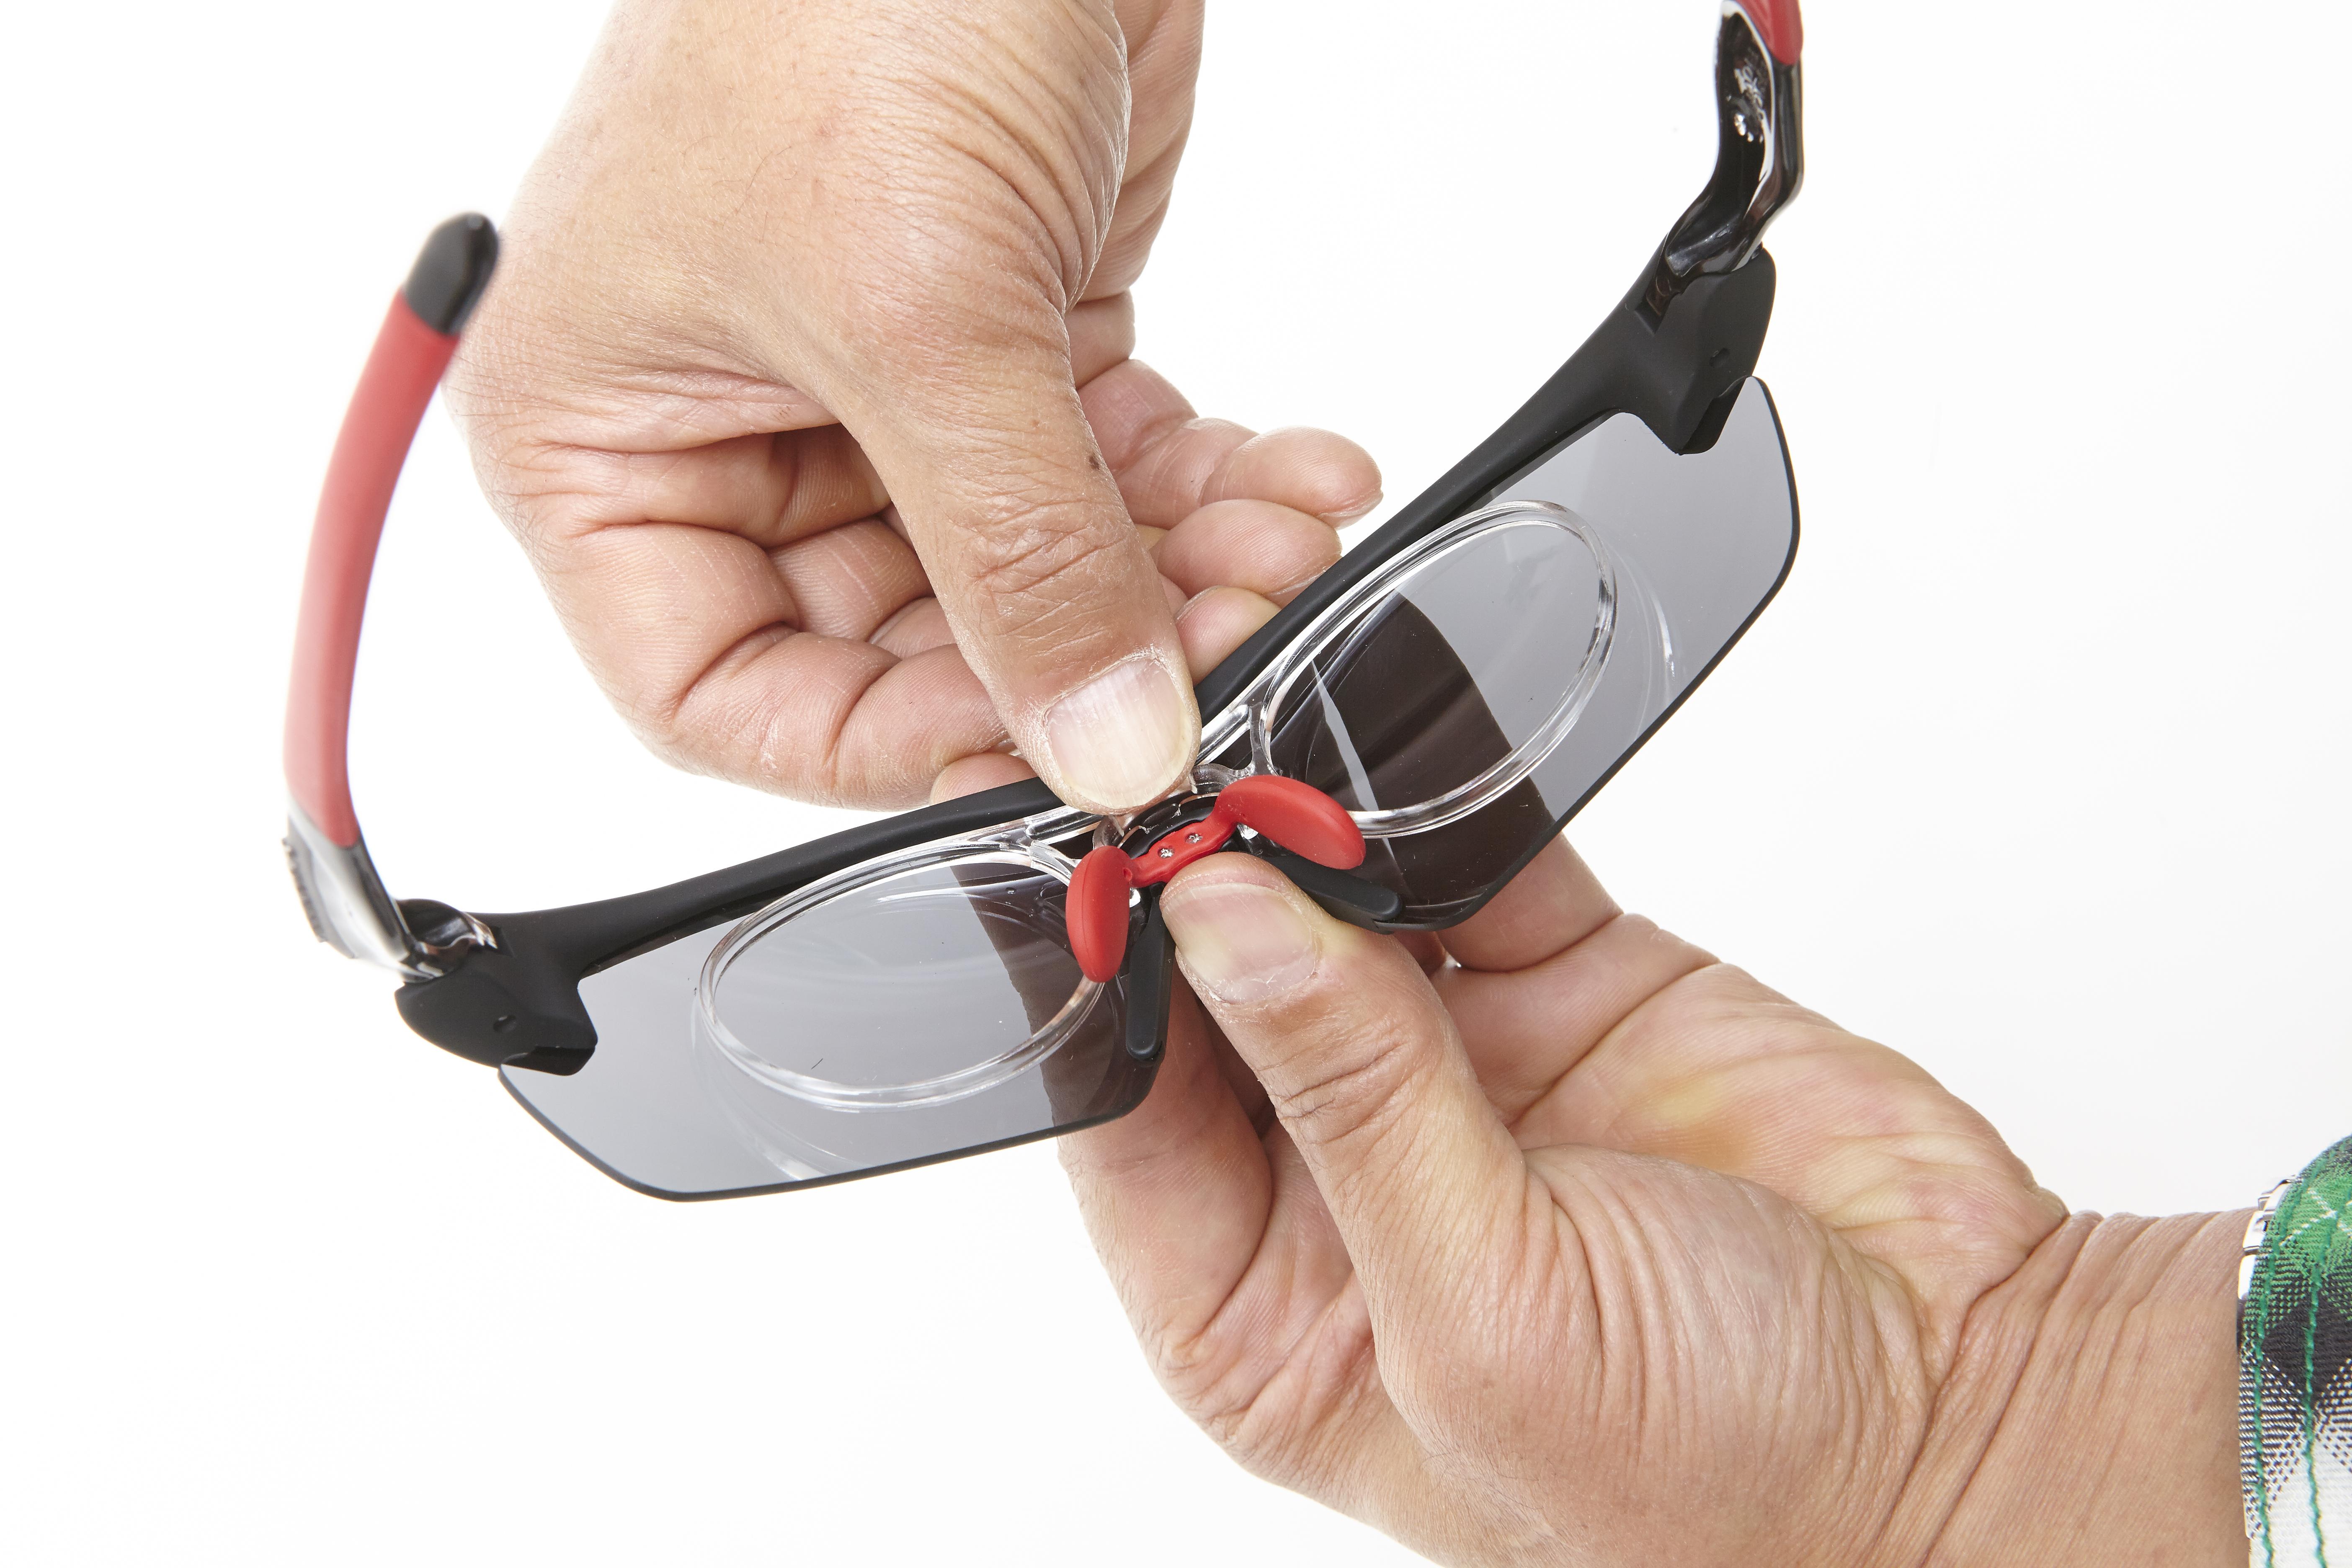 Gafas feelmorys ms-047 graduadas con clip óptico